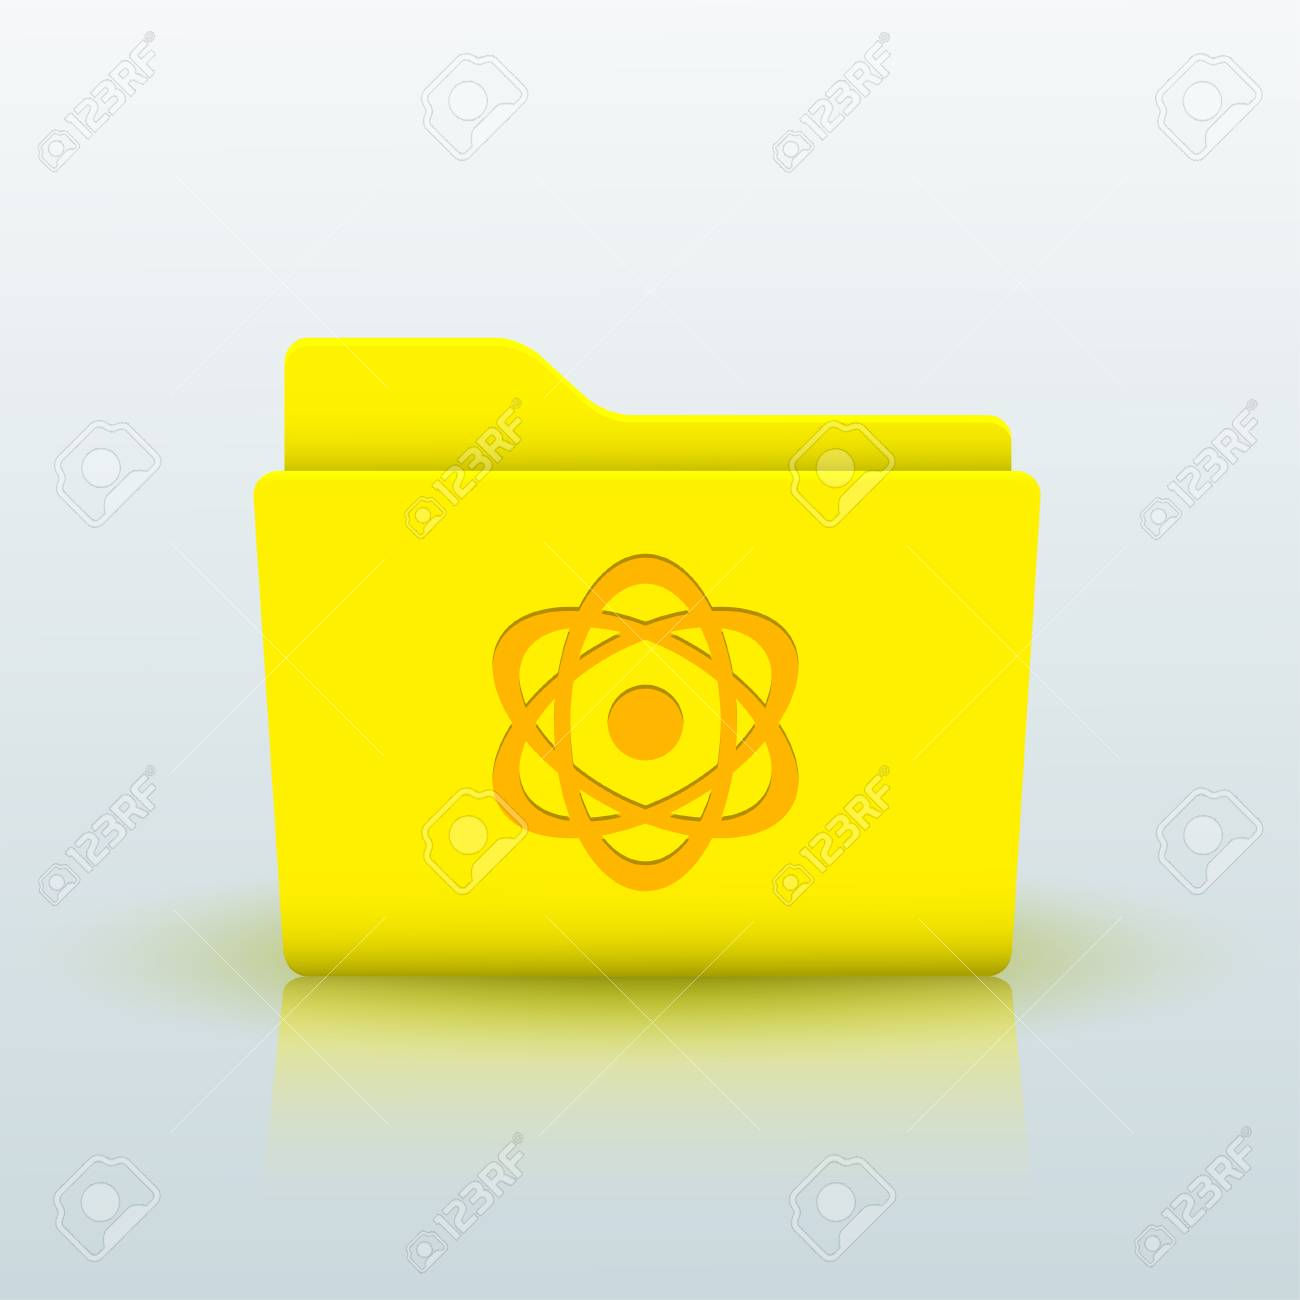 Vector yellow folder on blue background. Eps10 Stock Vector - 24808231